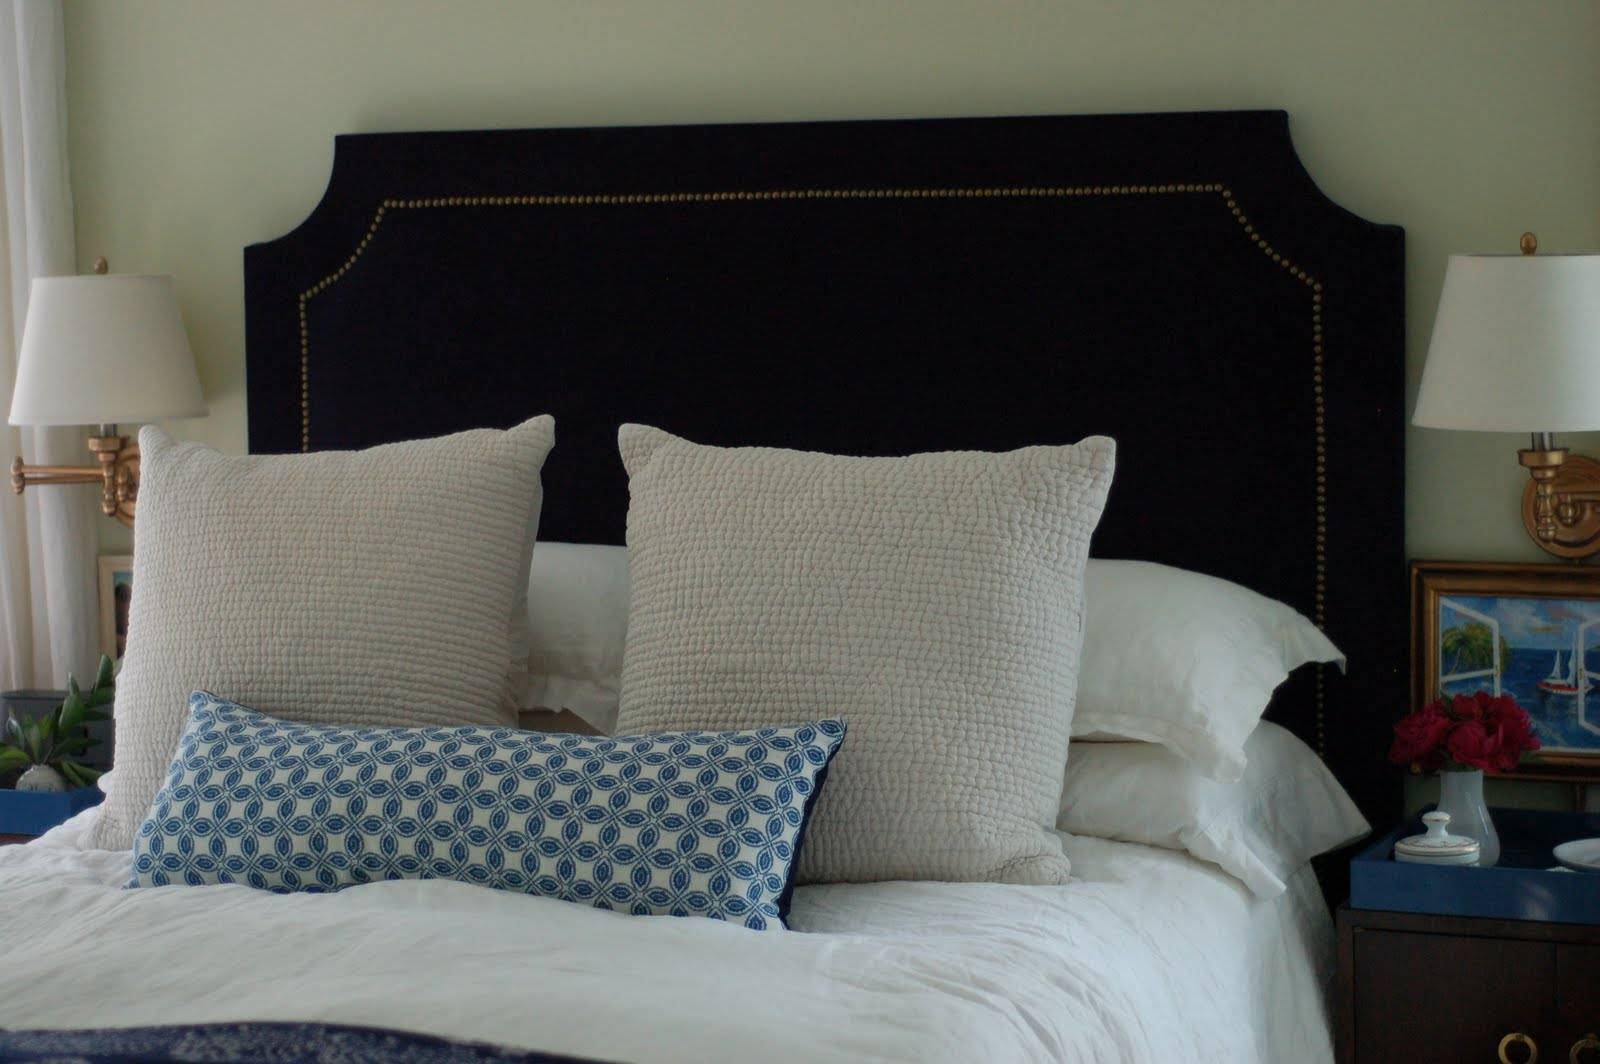 12 devonshire: DIY Upholstered Headboard with Nailhead Trim